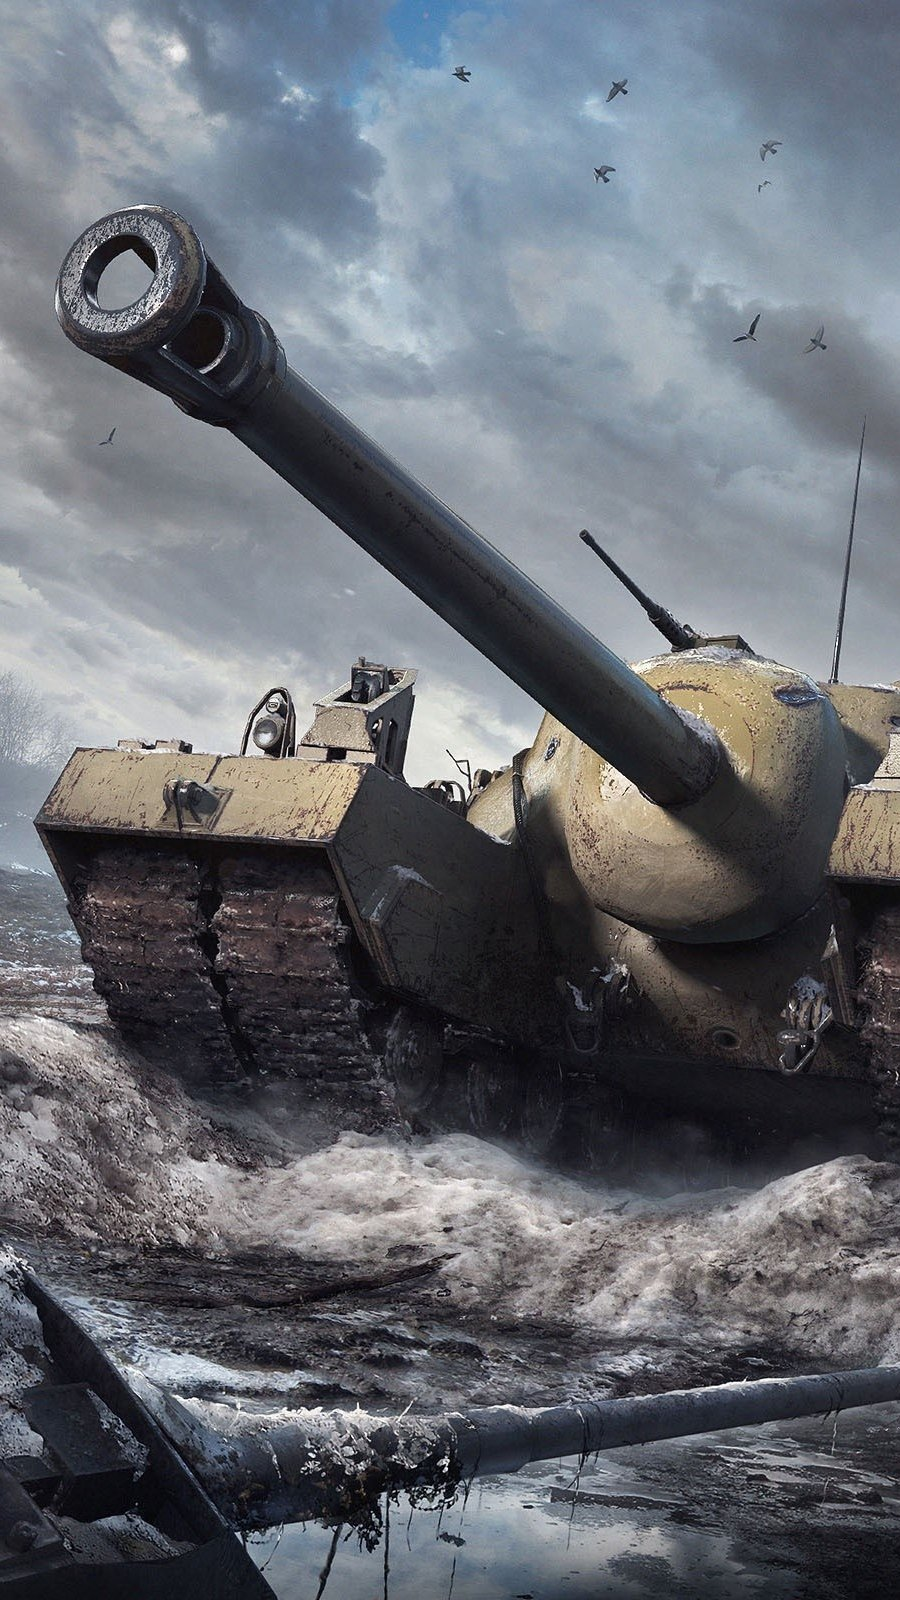 Fondos de pantalla T95 World Of Tanks Vertical